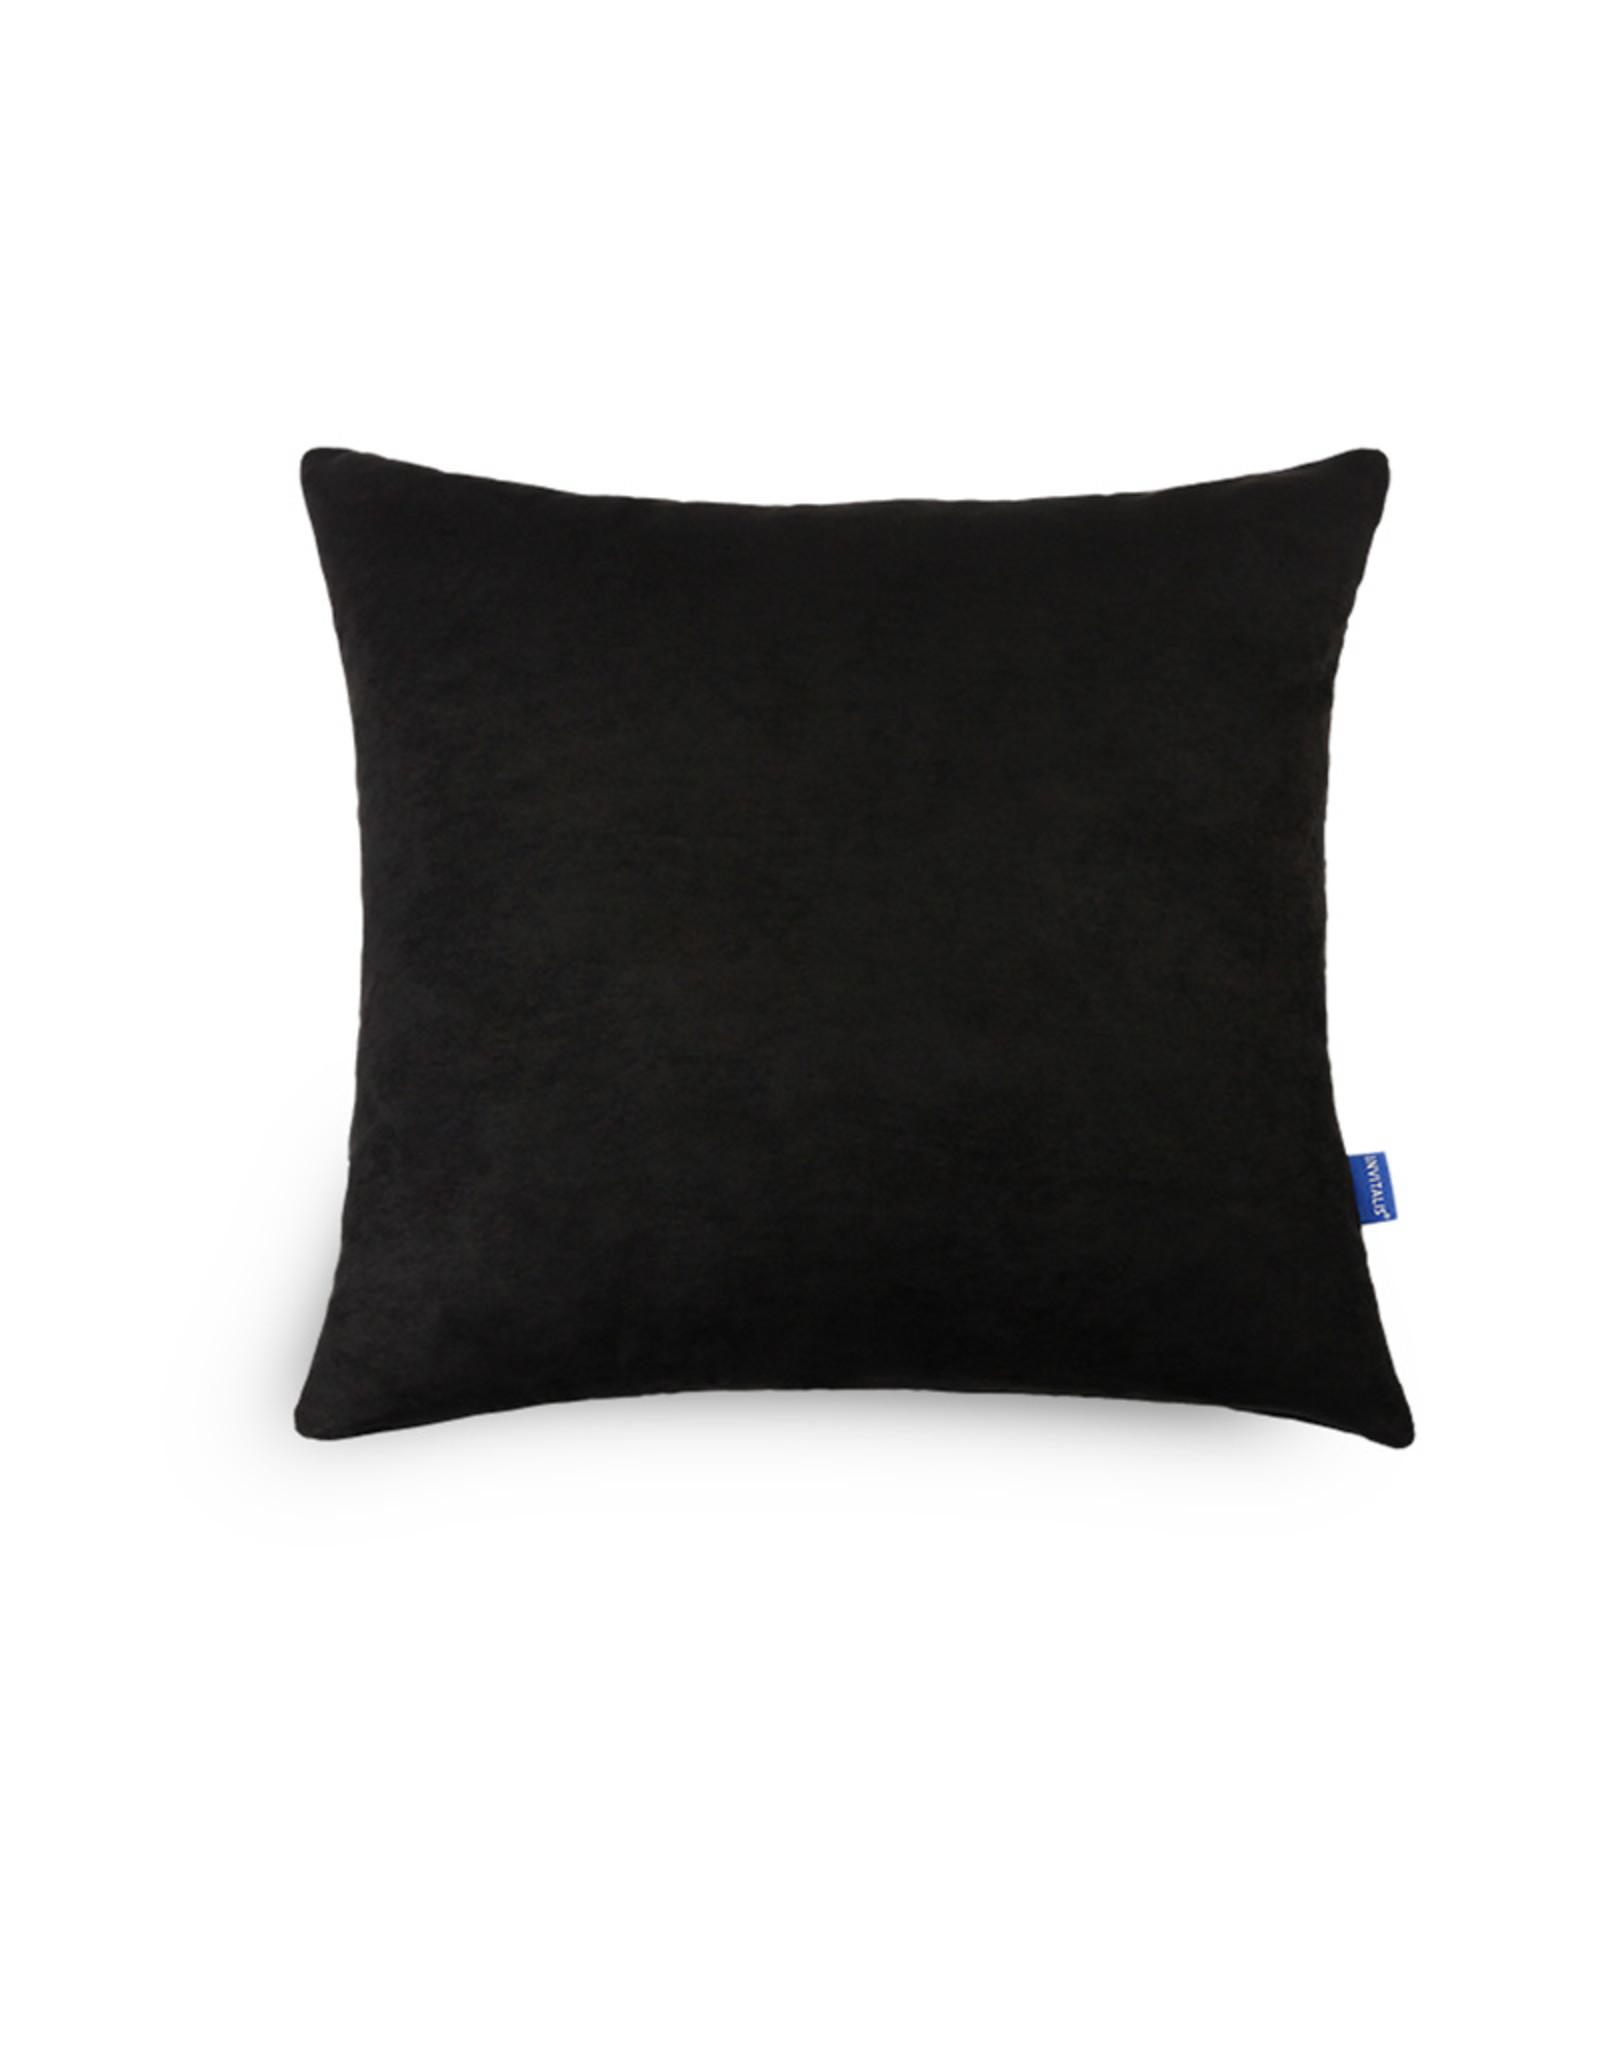 INVITALIS Vitalymed Soft - Black